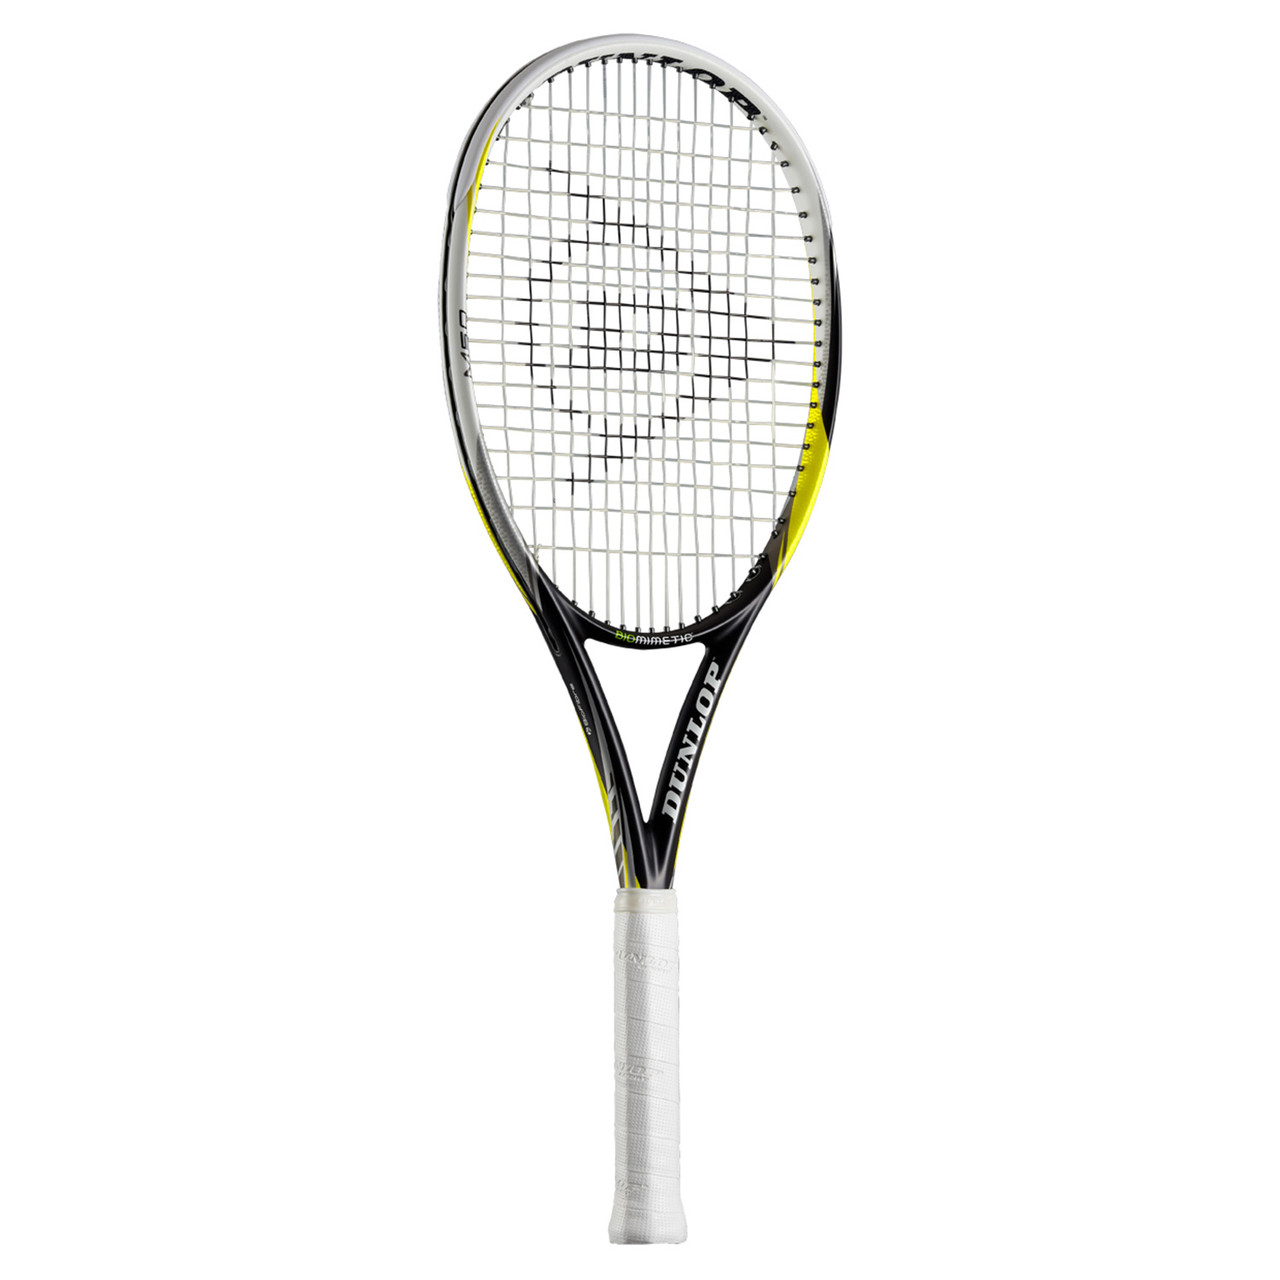 Теннисная ракетка Dunlop D Tr Biomimetic M5.0 G2 Hl 676265-NC